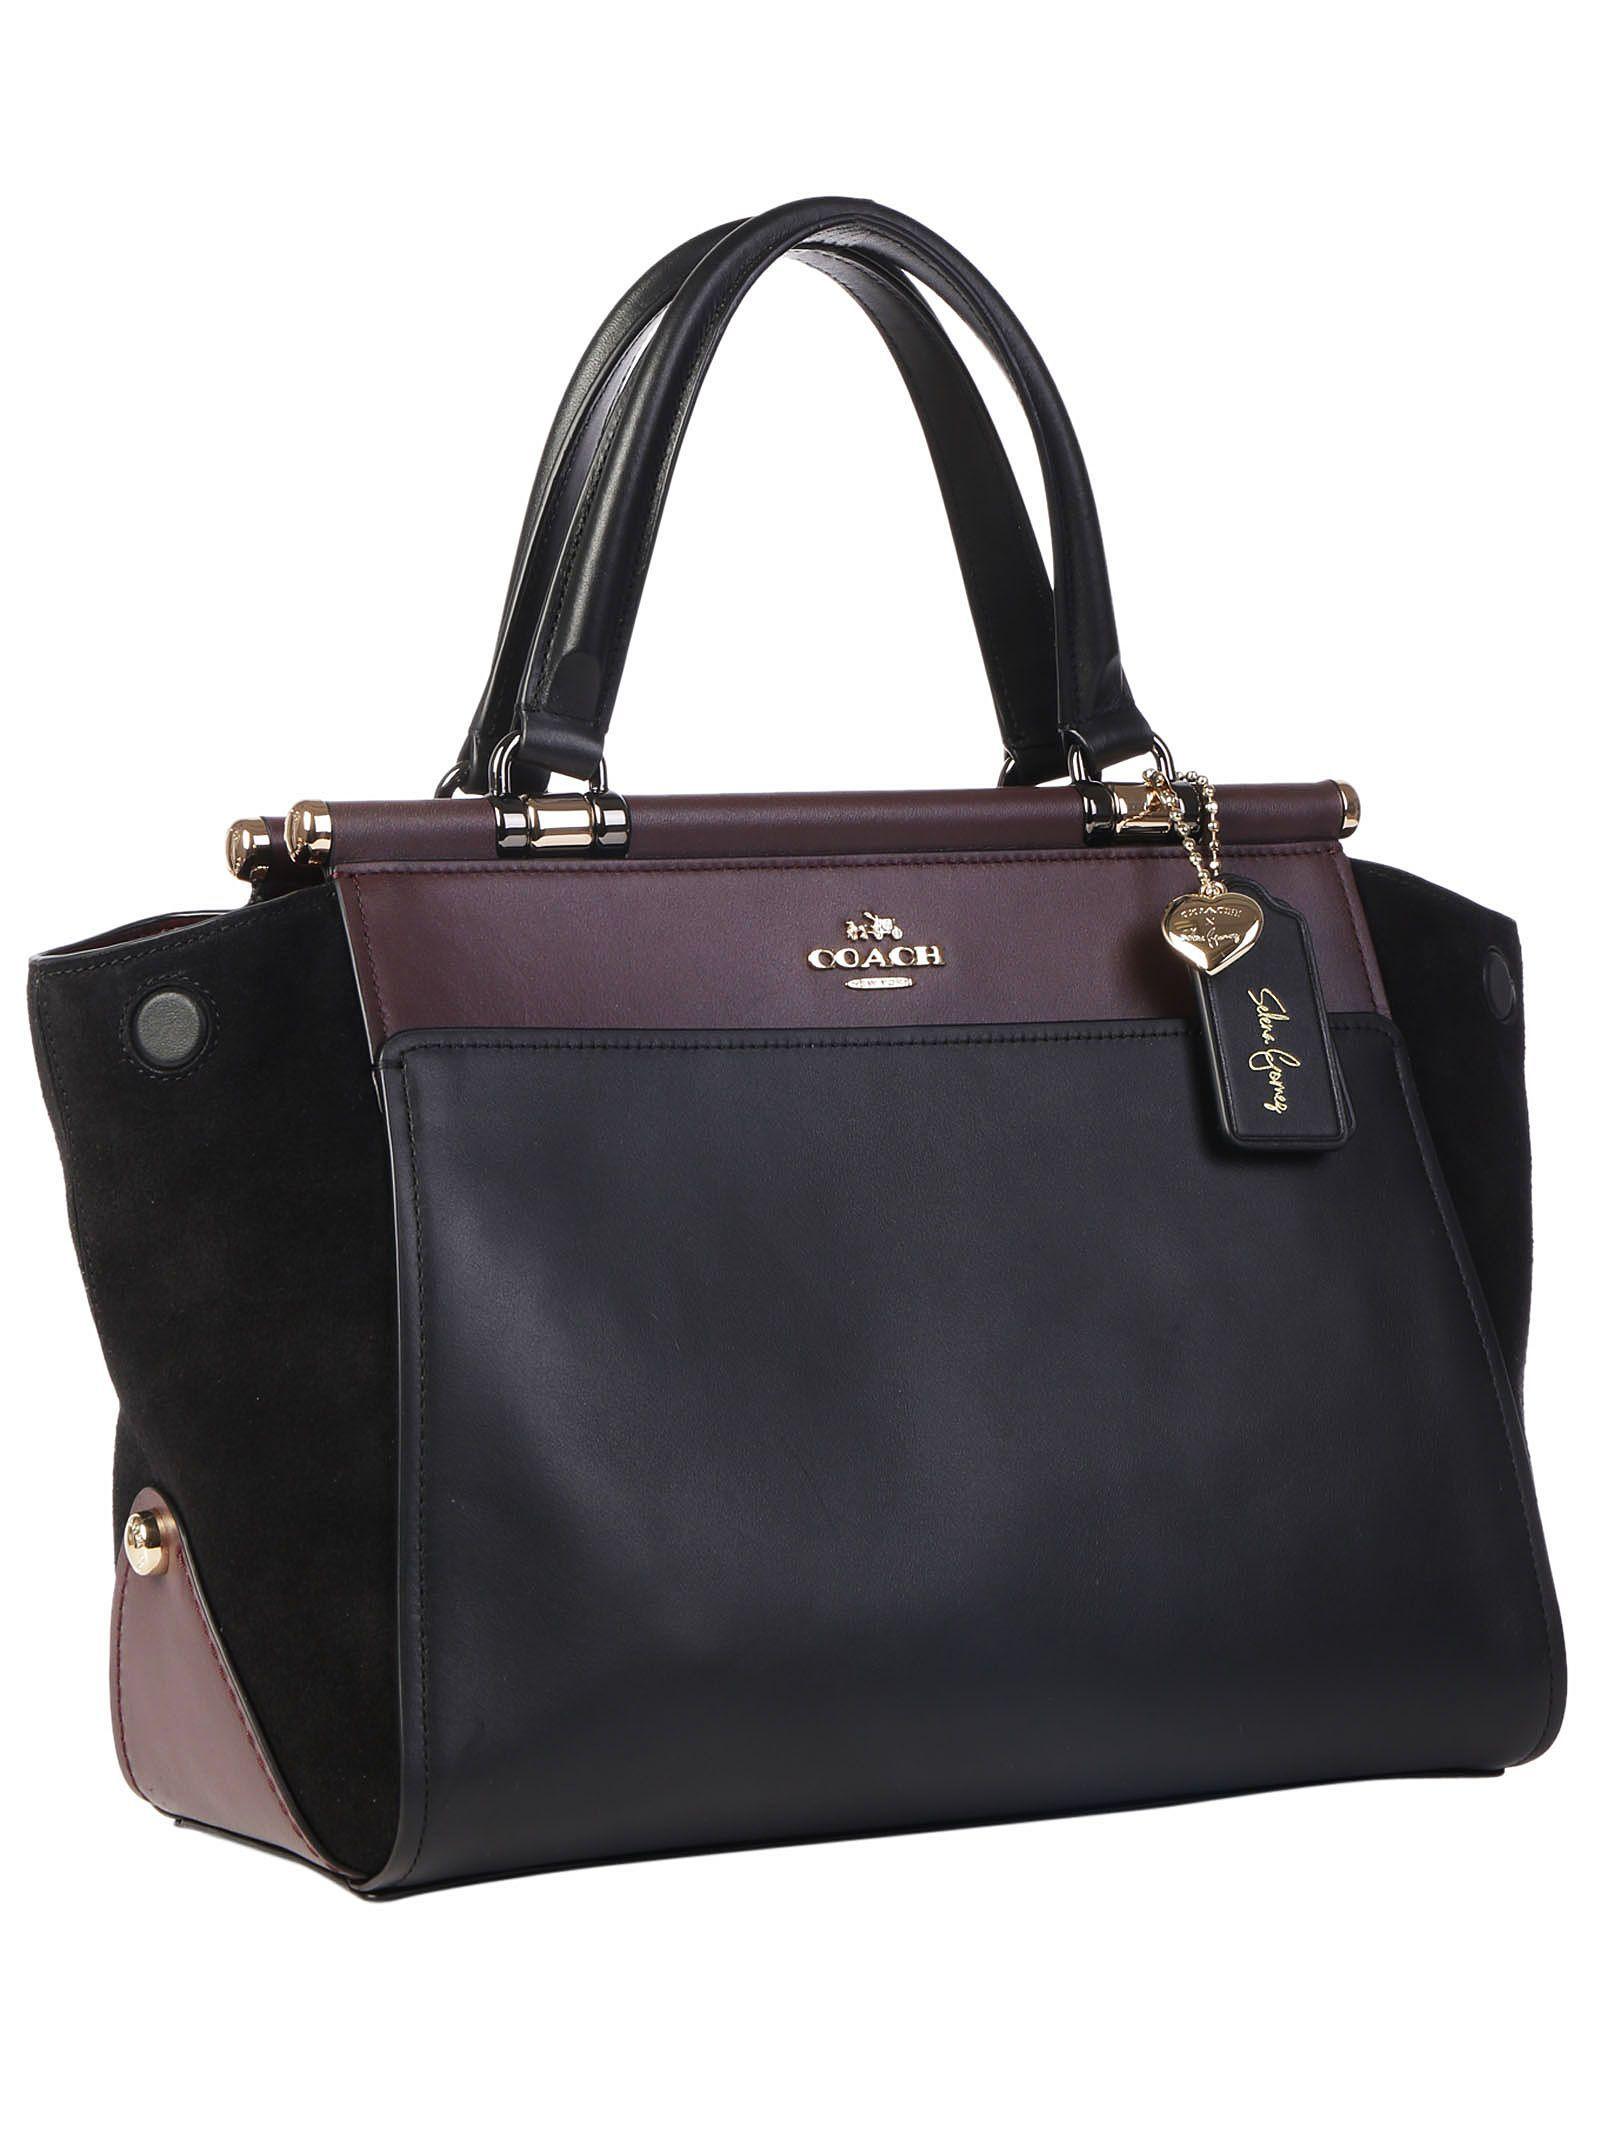 Coach X Selena Gomez Handbag Bags Lining Accessories Metallic